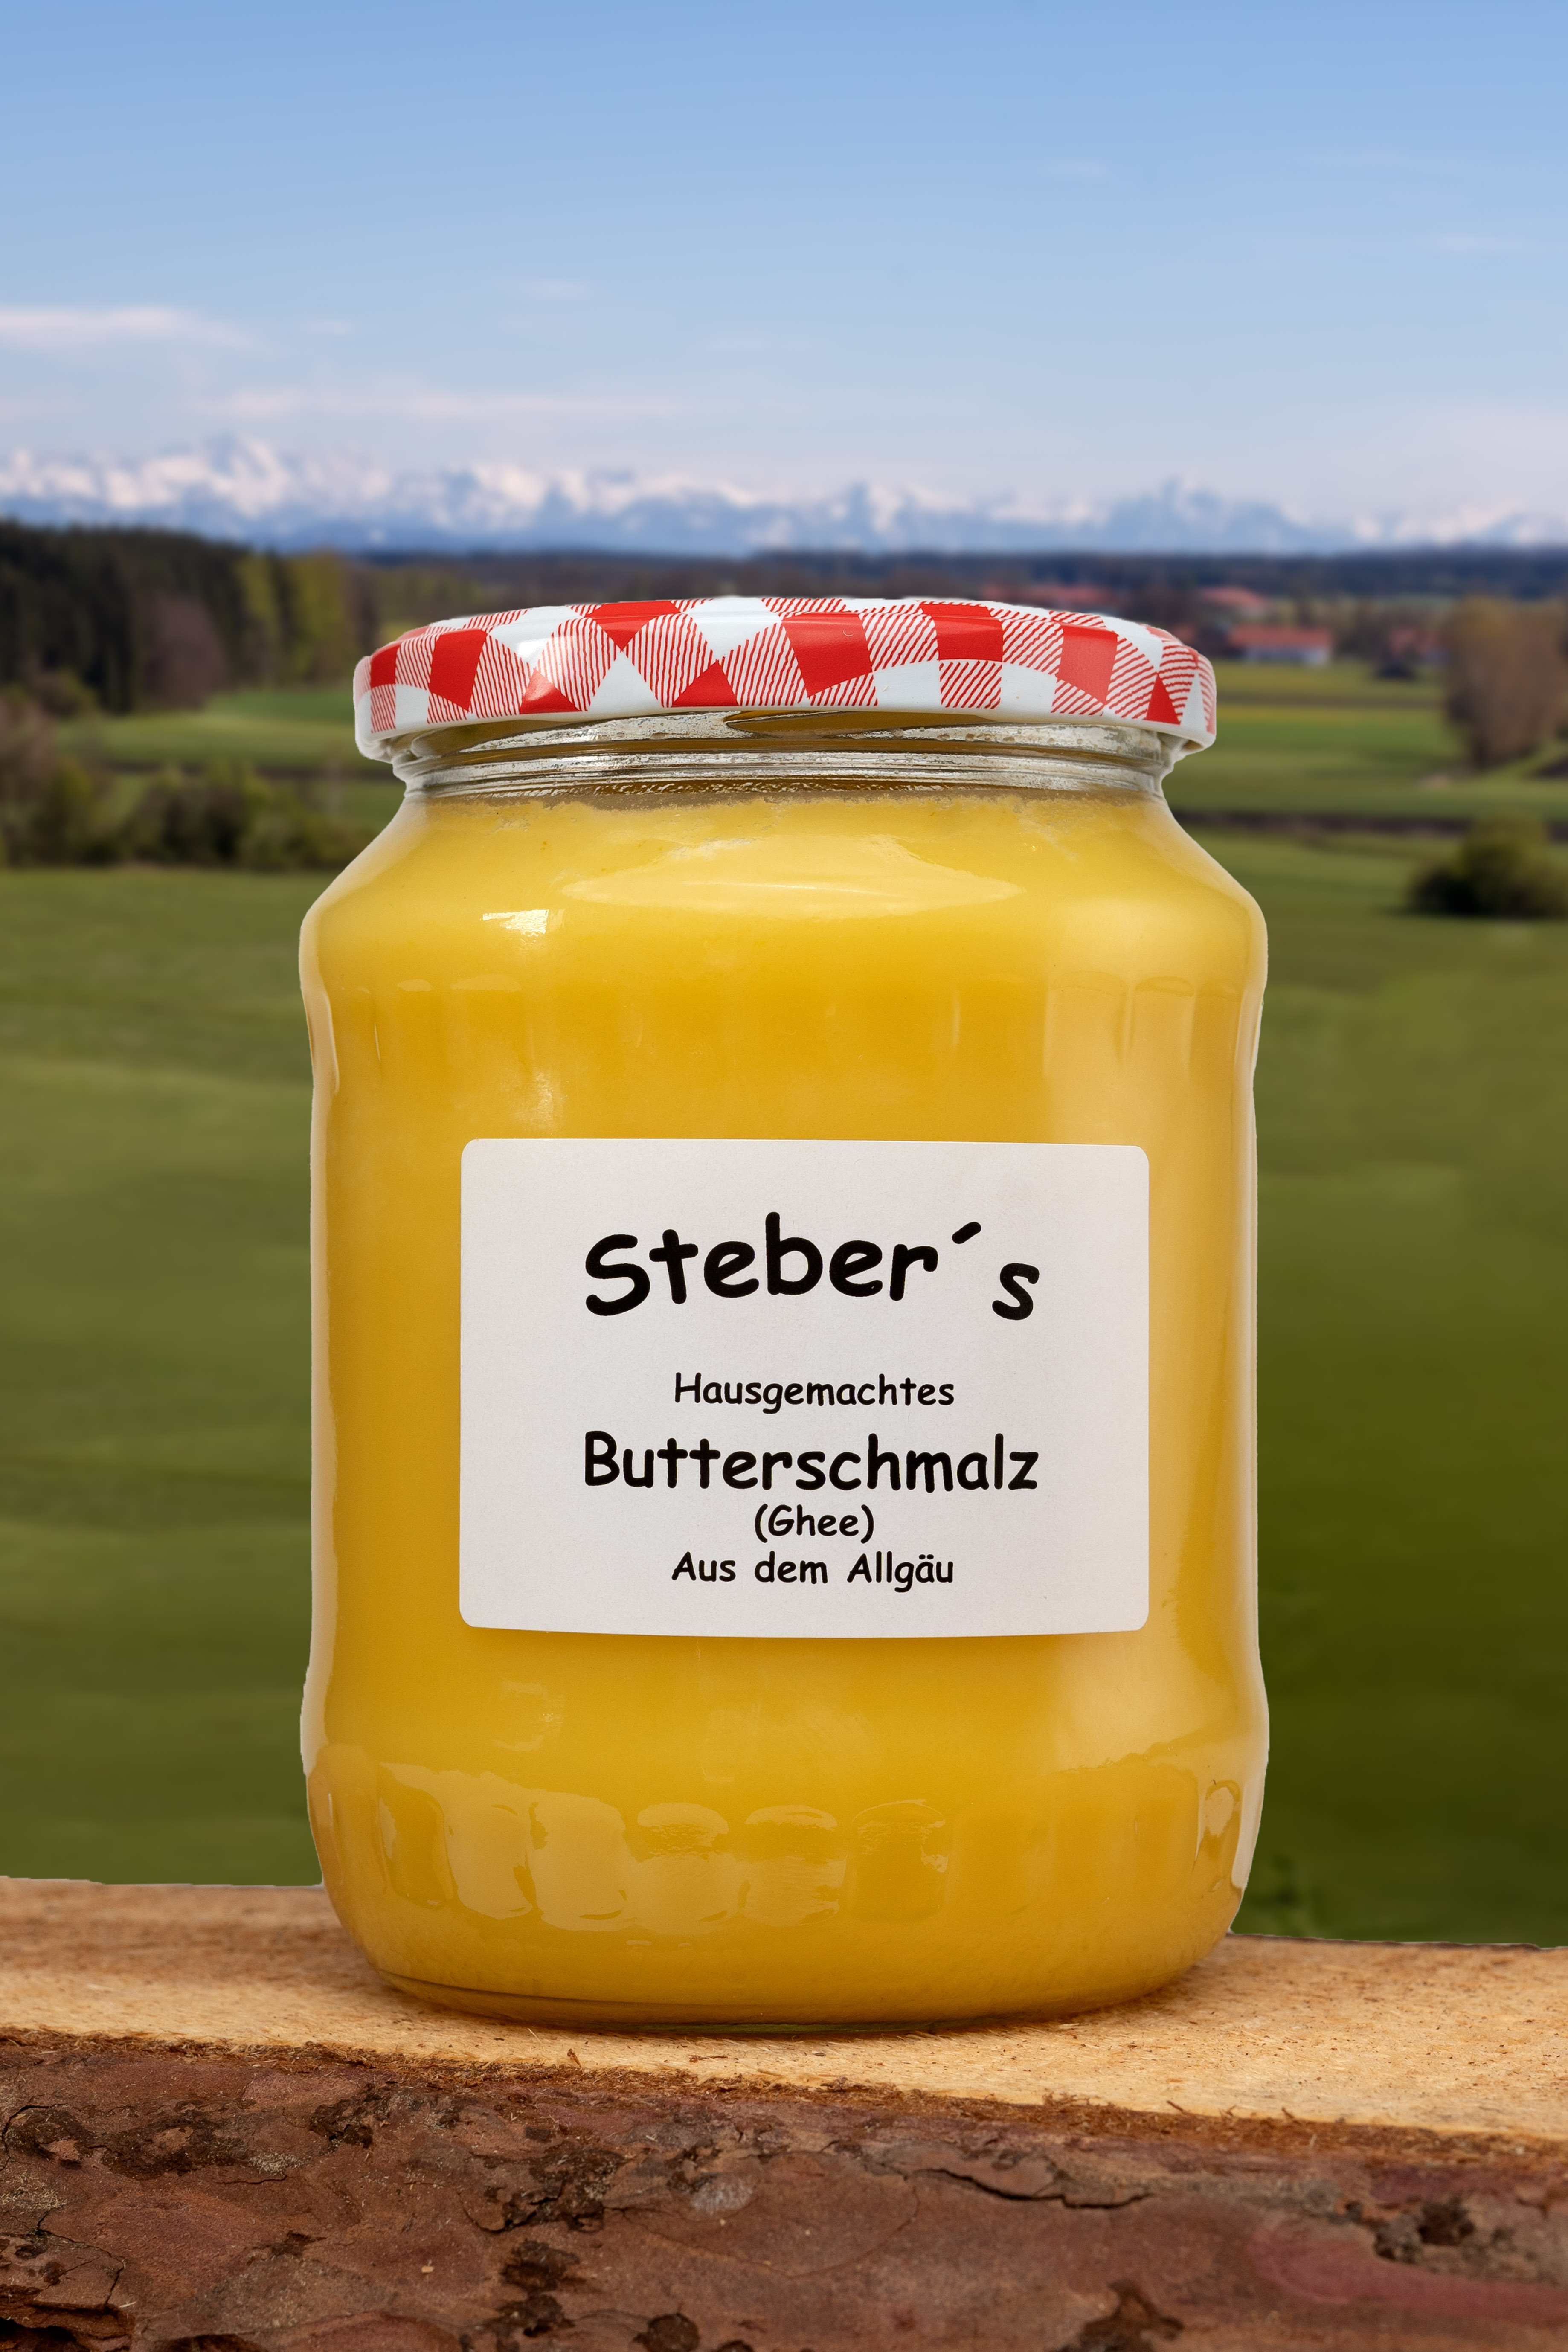 Steber's Butterschmalz